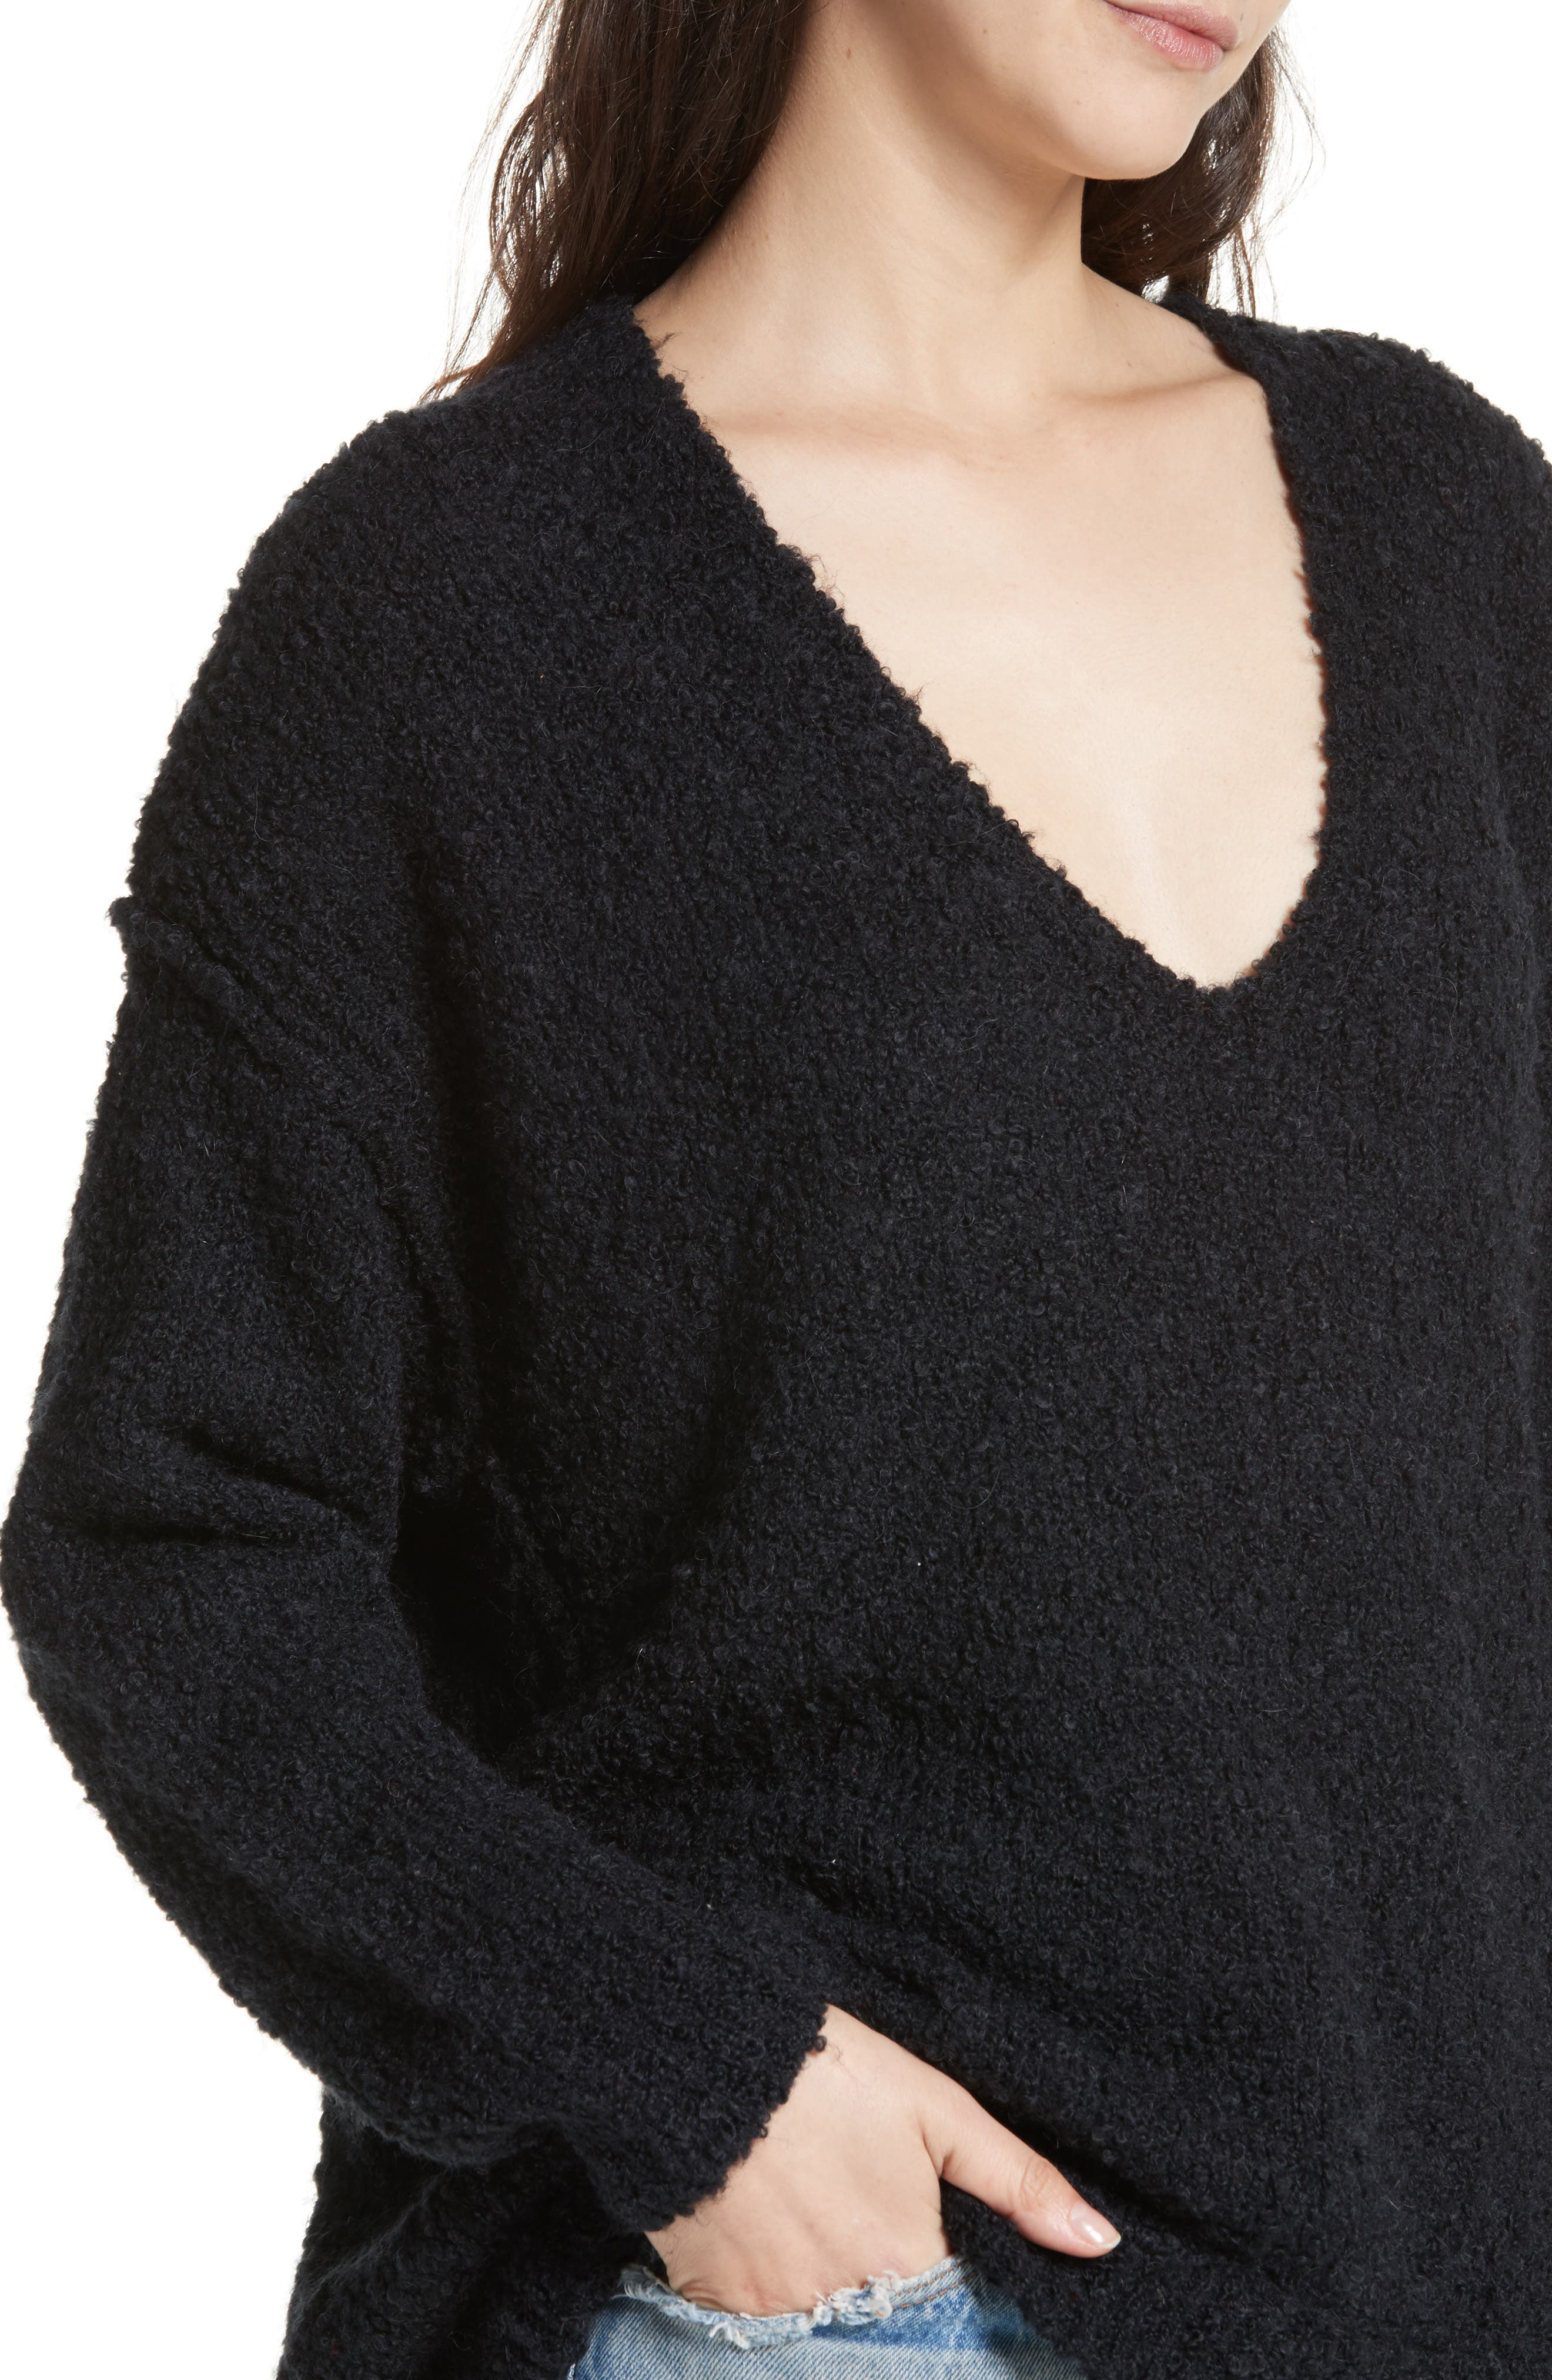 Lofty V-Neck Sweater,                             Alternate thumbnail 4, color,                             001